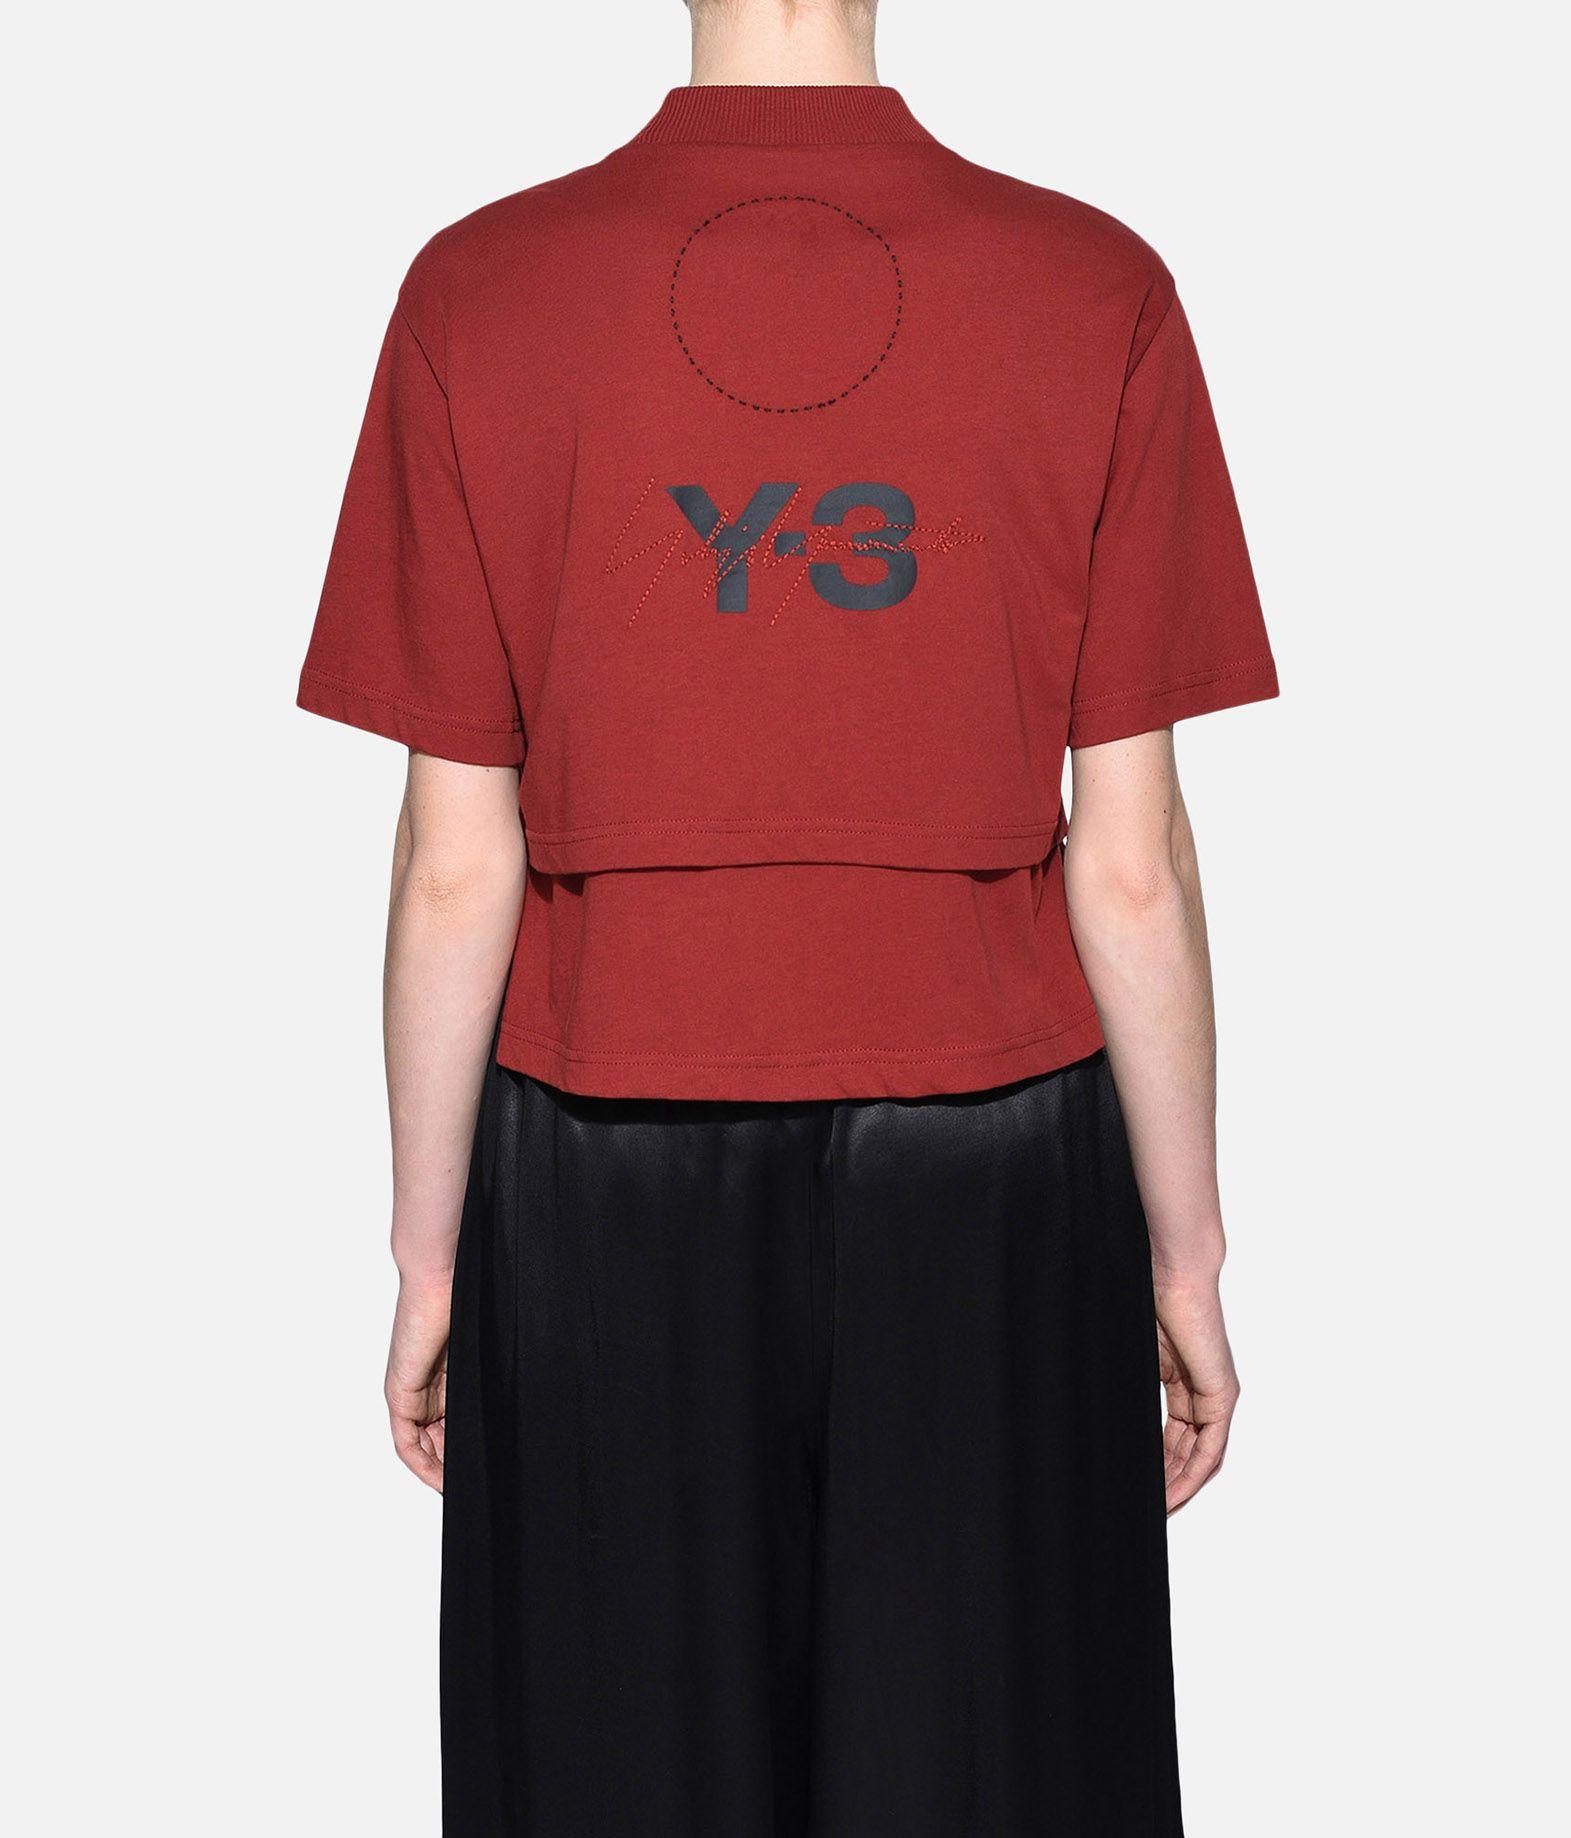 Y-3 Y-3 Signature Long Tee T-shirt maniche corte Donna d